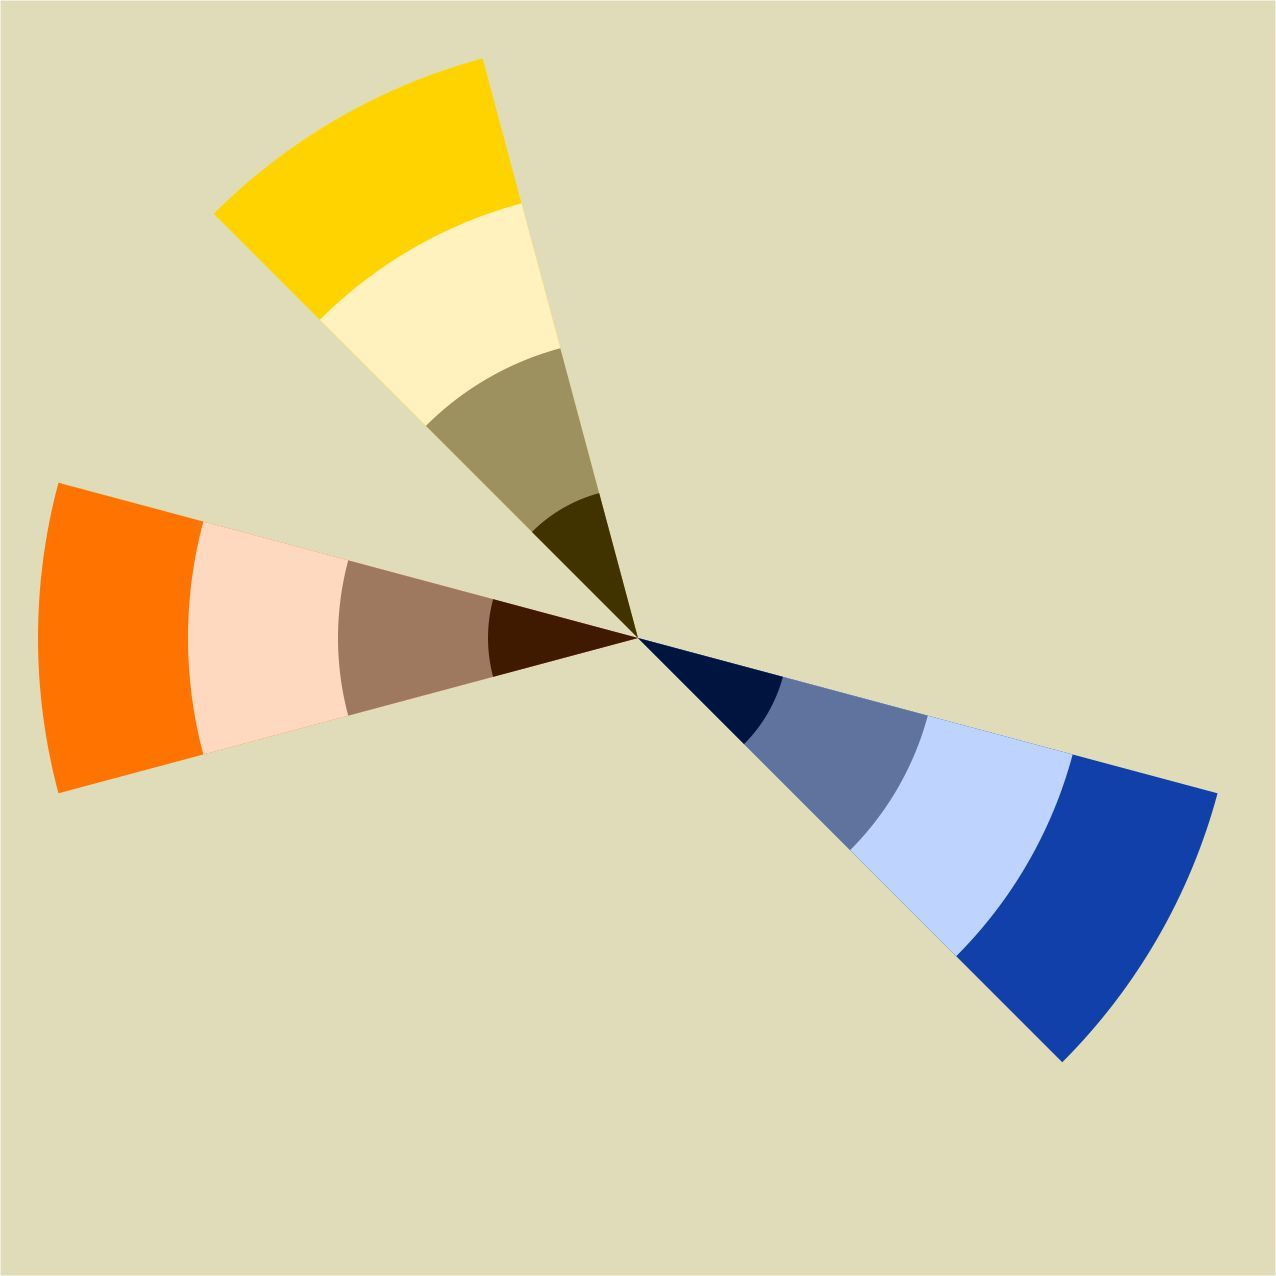 Split Comp Blue Yellow Orange Red Orange Split Complementary Colors Split Complementary Split Complementary Color Scheme